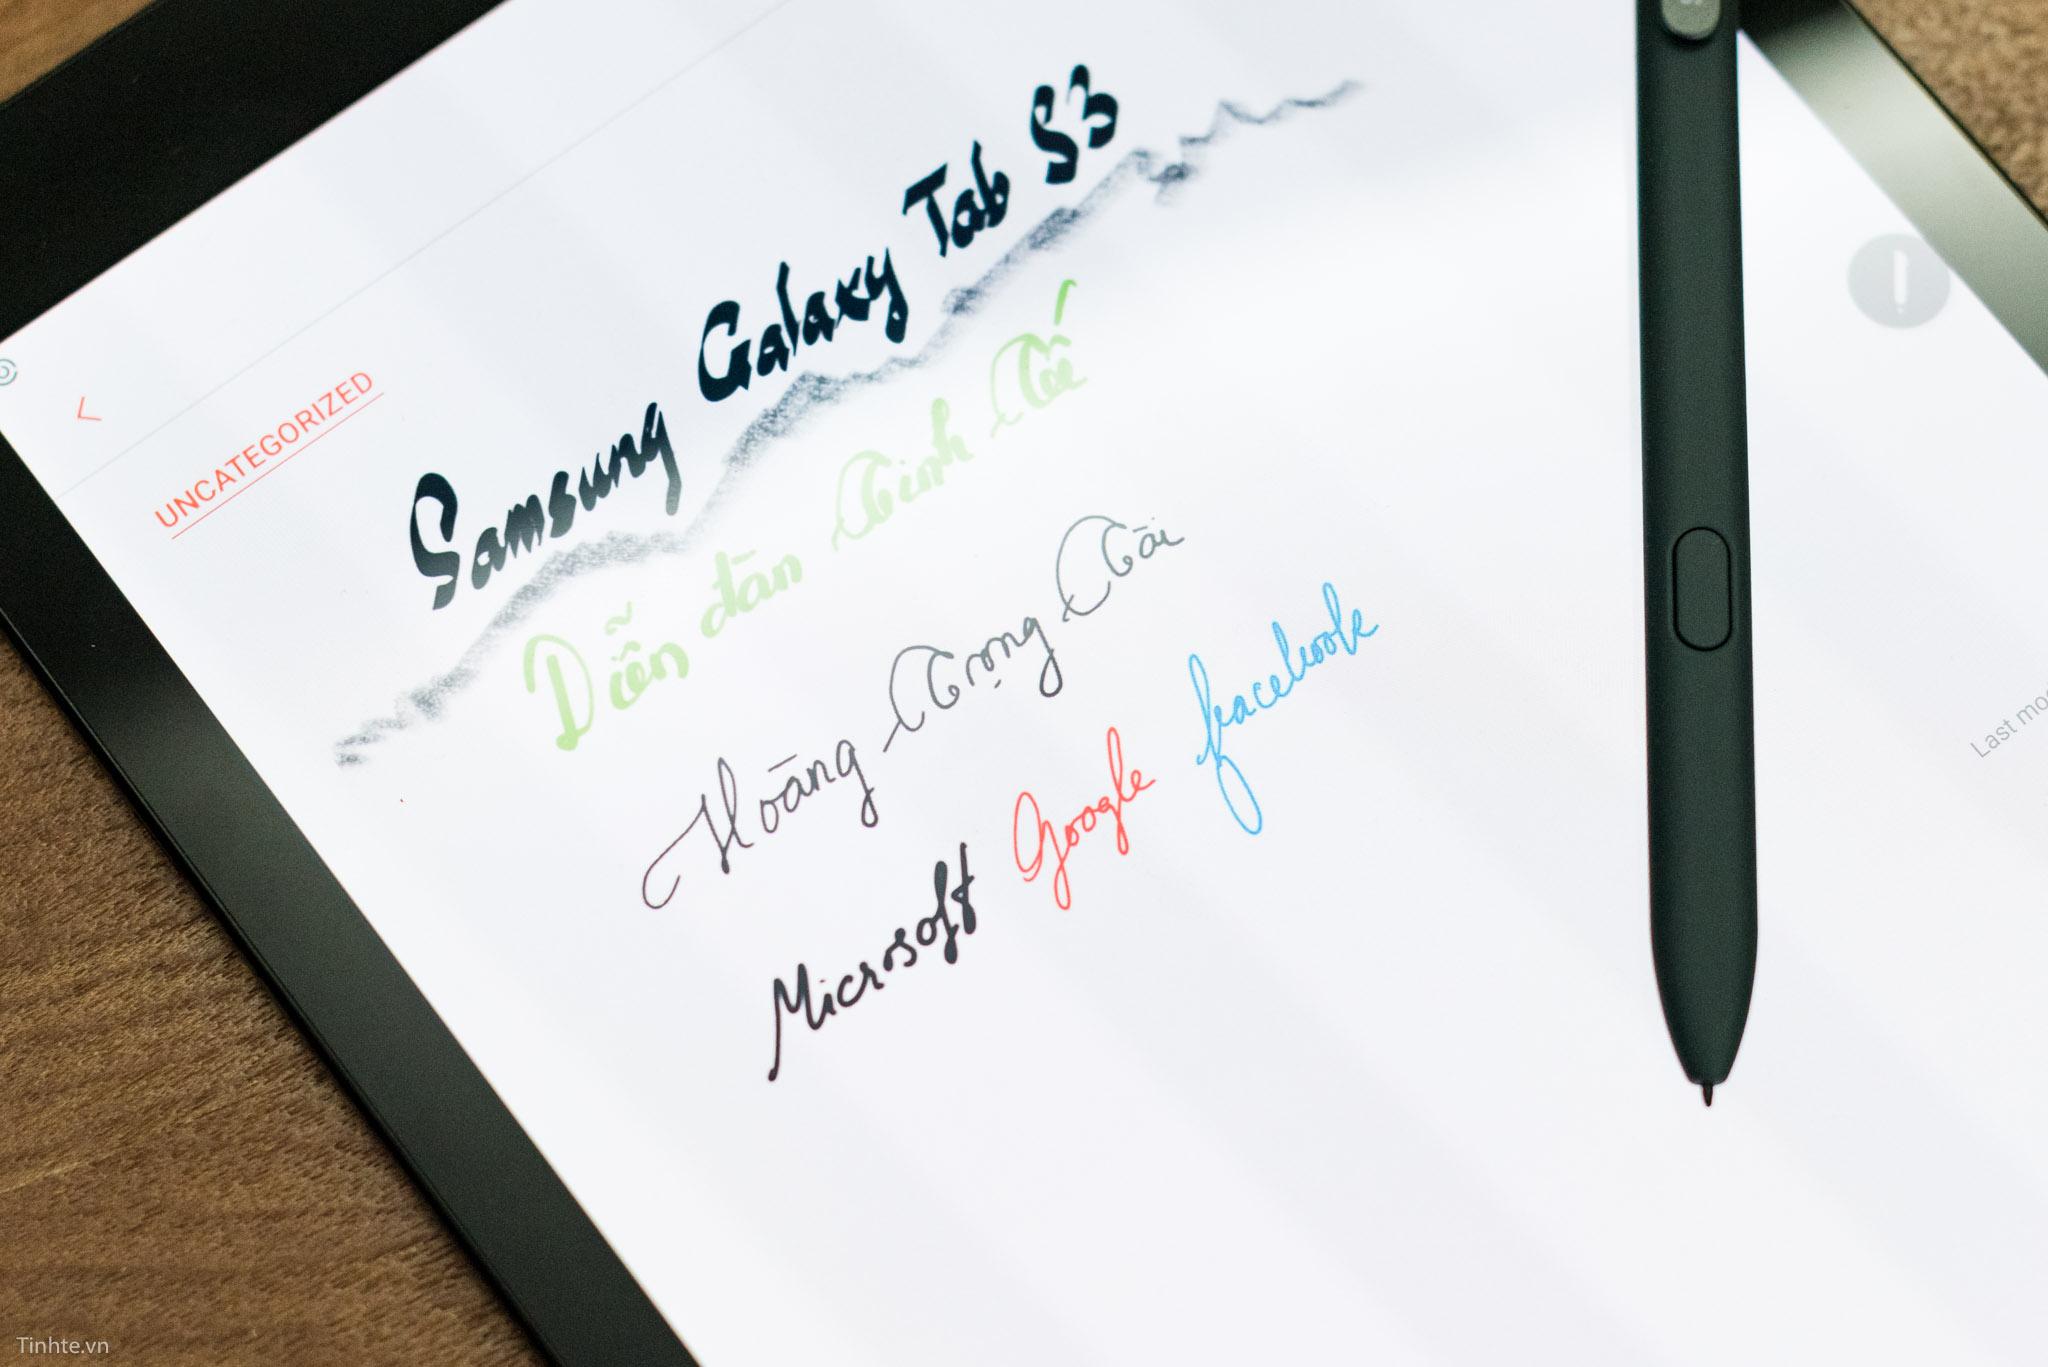 samsung-galaxy-tab-s3-tinhte-12.jpg